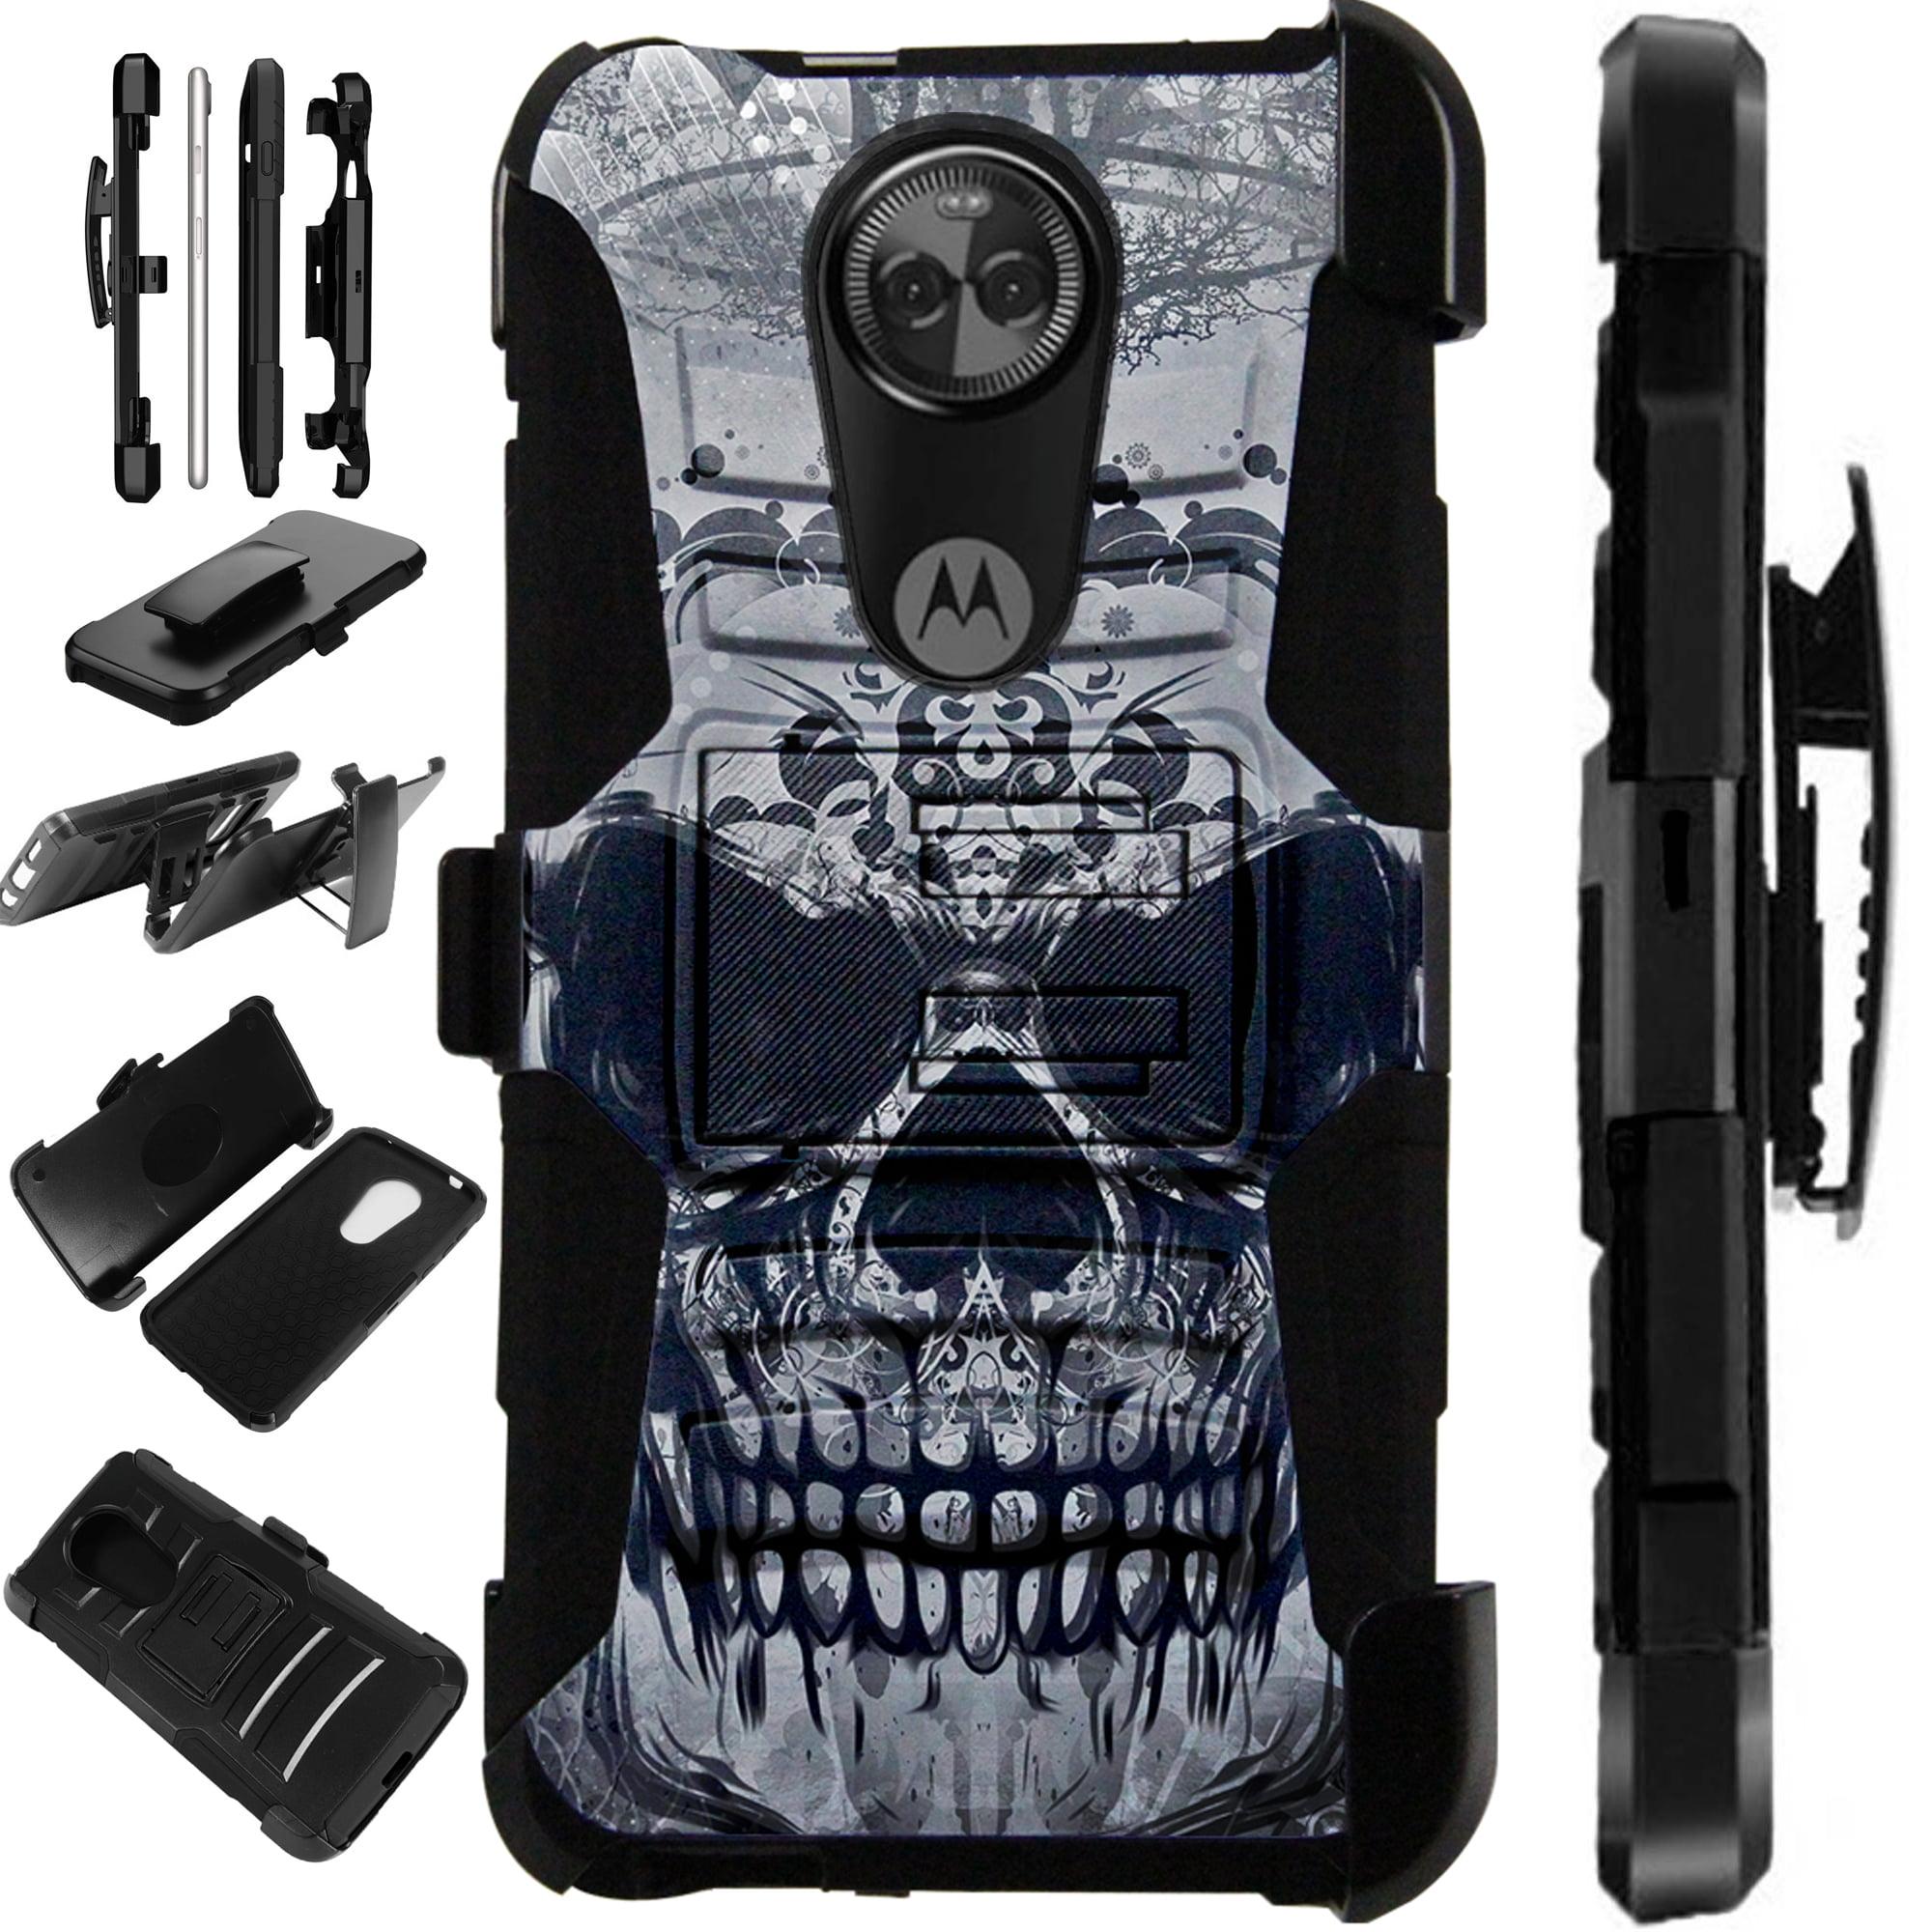 For Motorola Moto E5 Play | Moto E5 Cruise Case Armor Hybrid Silicone Cover Stand LuxGuard Holster (Gray Evil Skull)